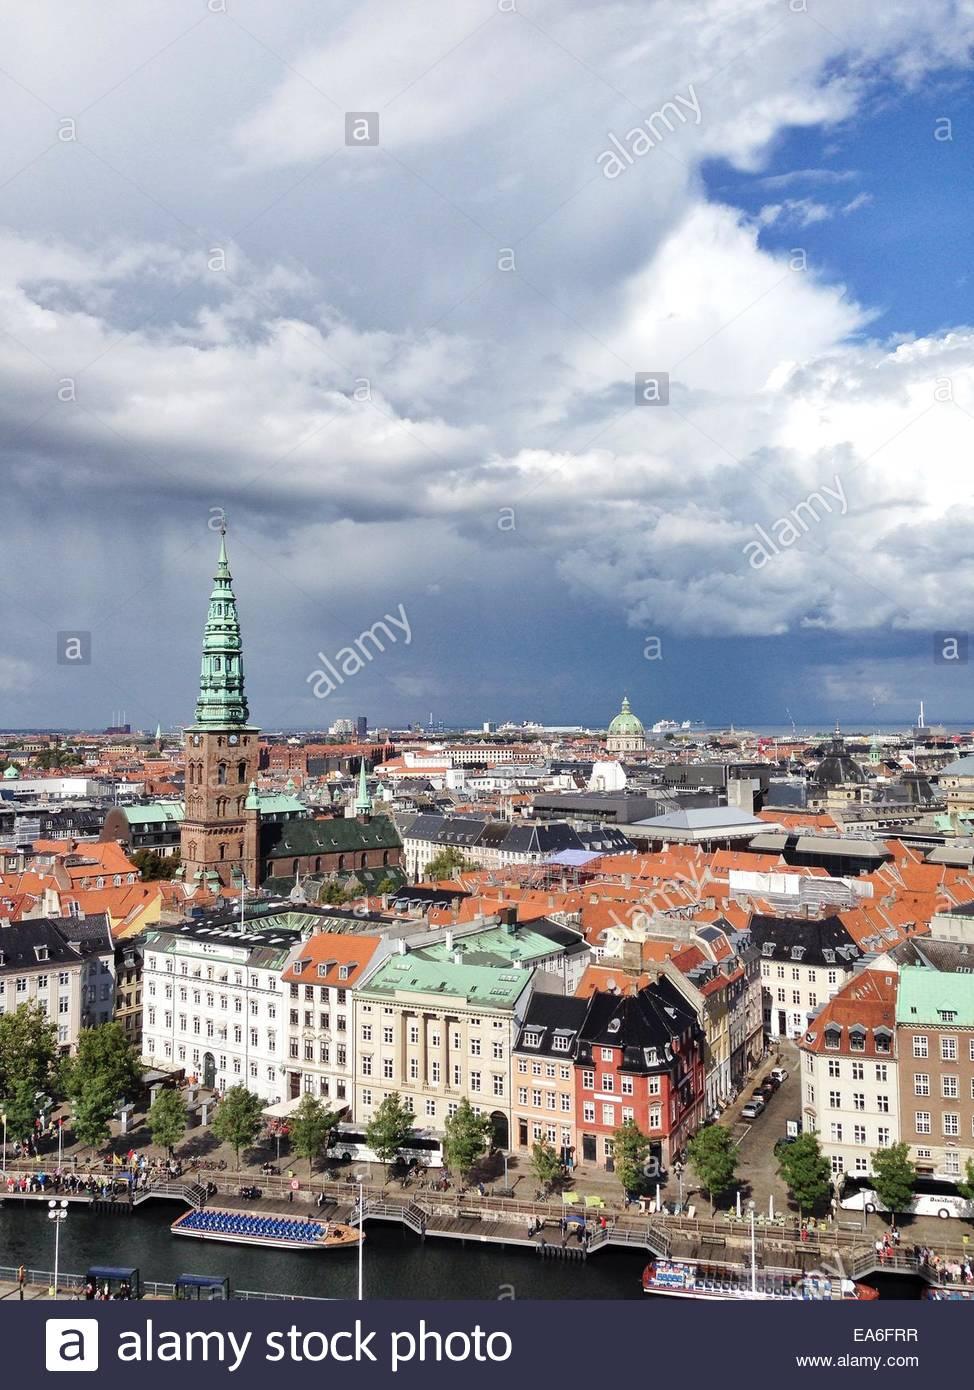 Denmark, Elevated view of Copenhagen cityscape - Stock Image